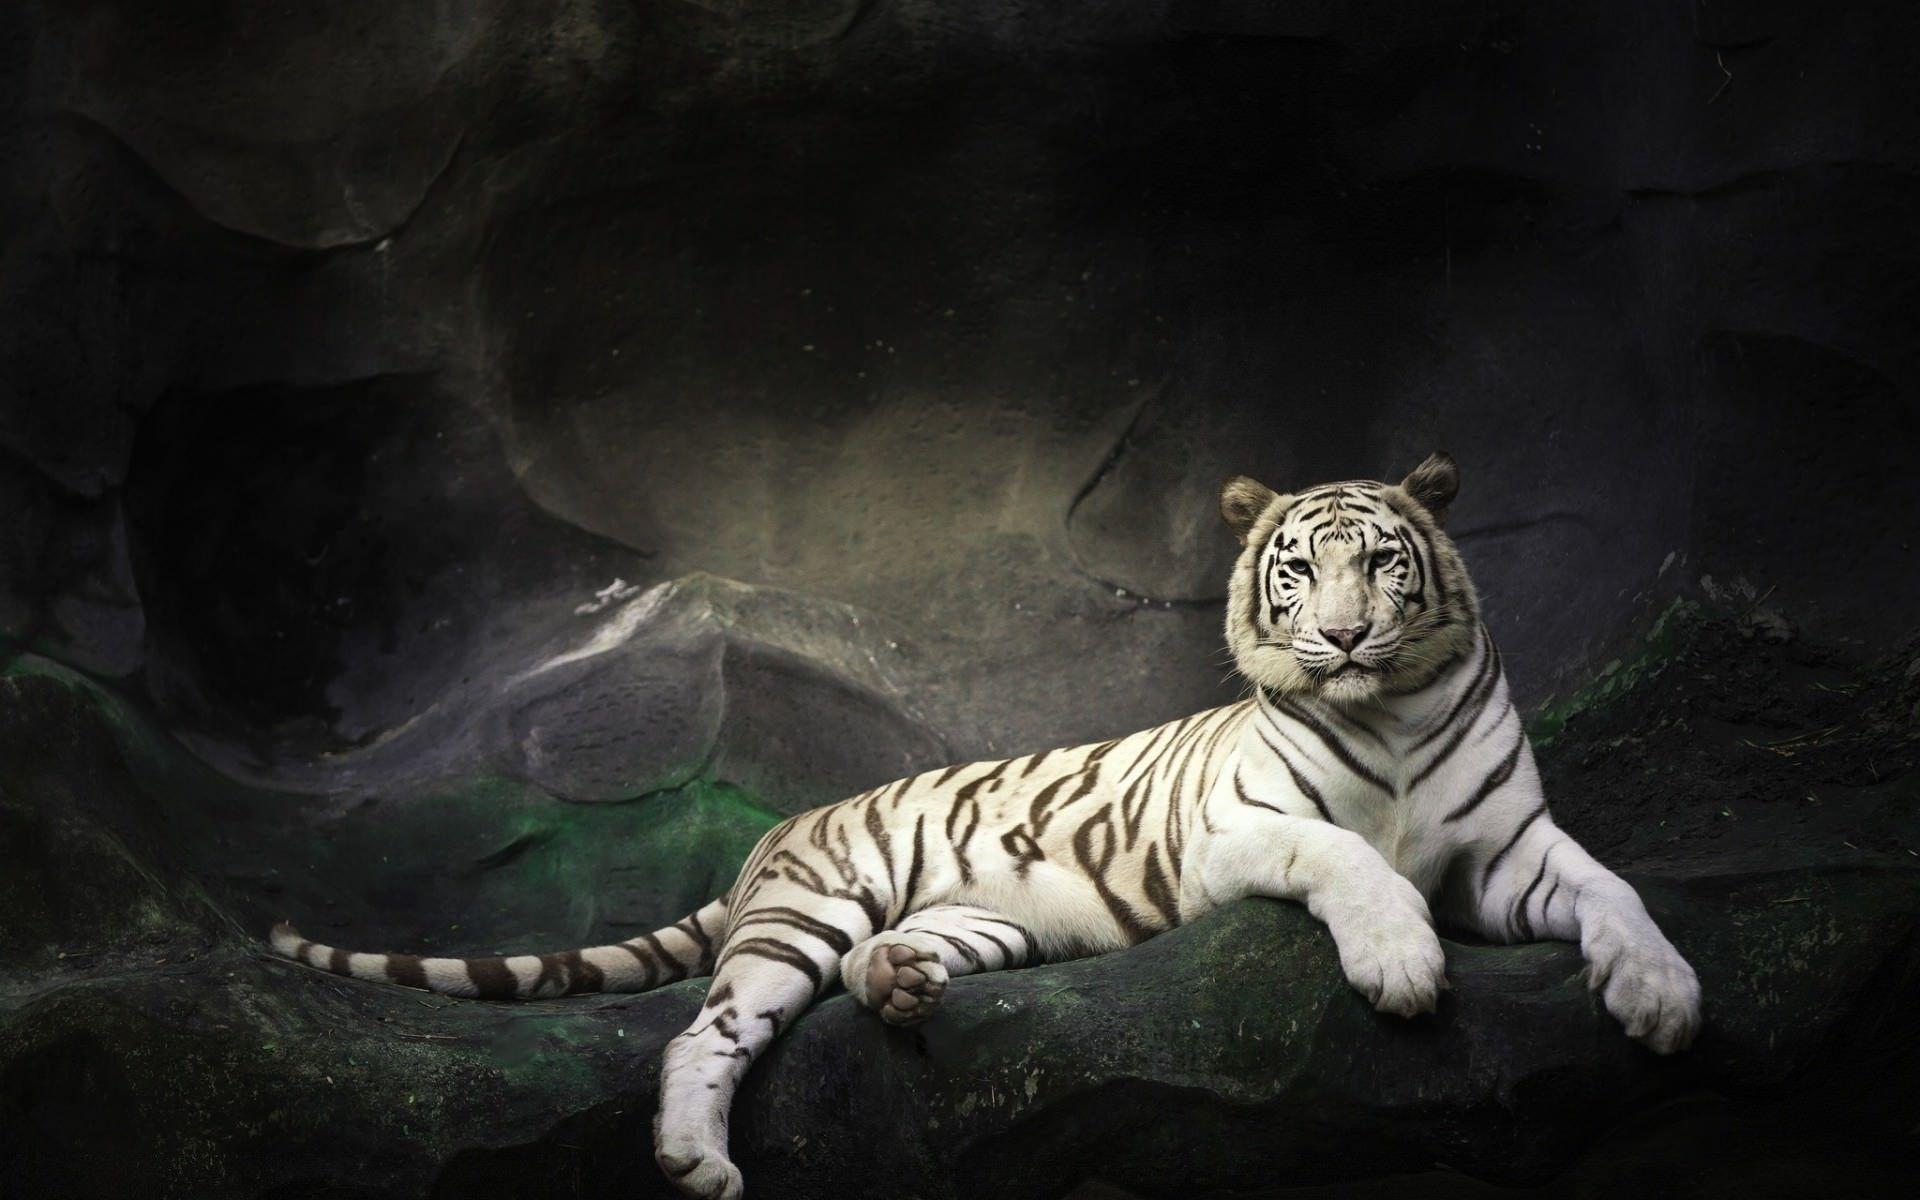 3d tiger top hd new cool for desktop background Tiger